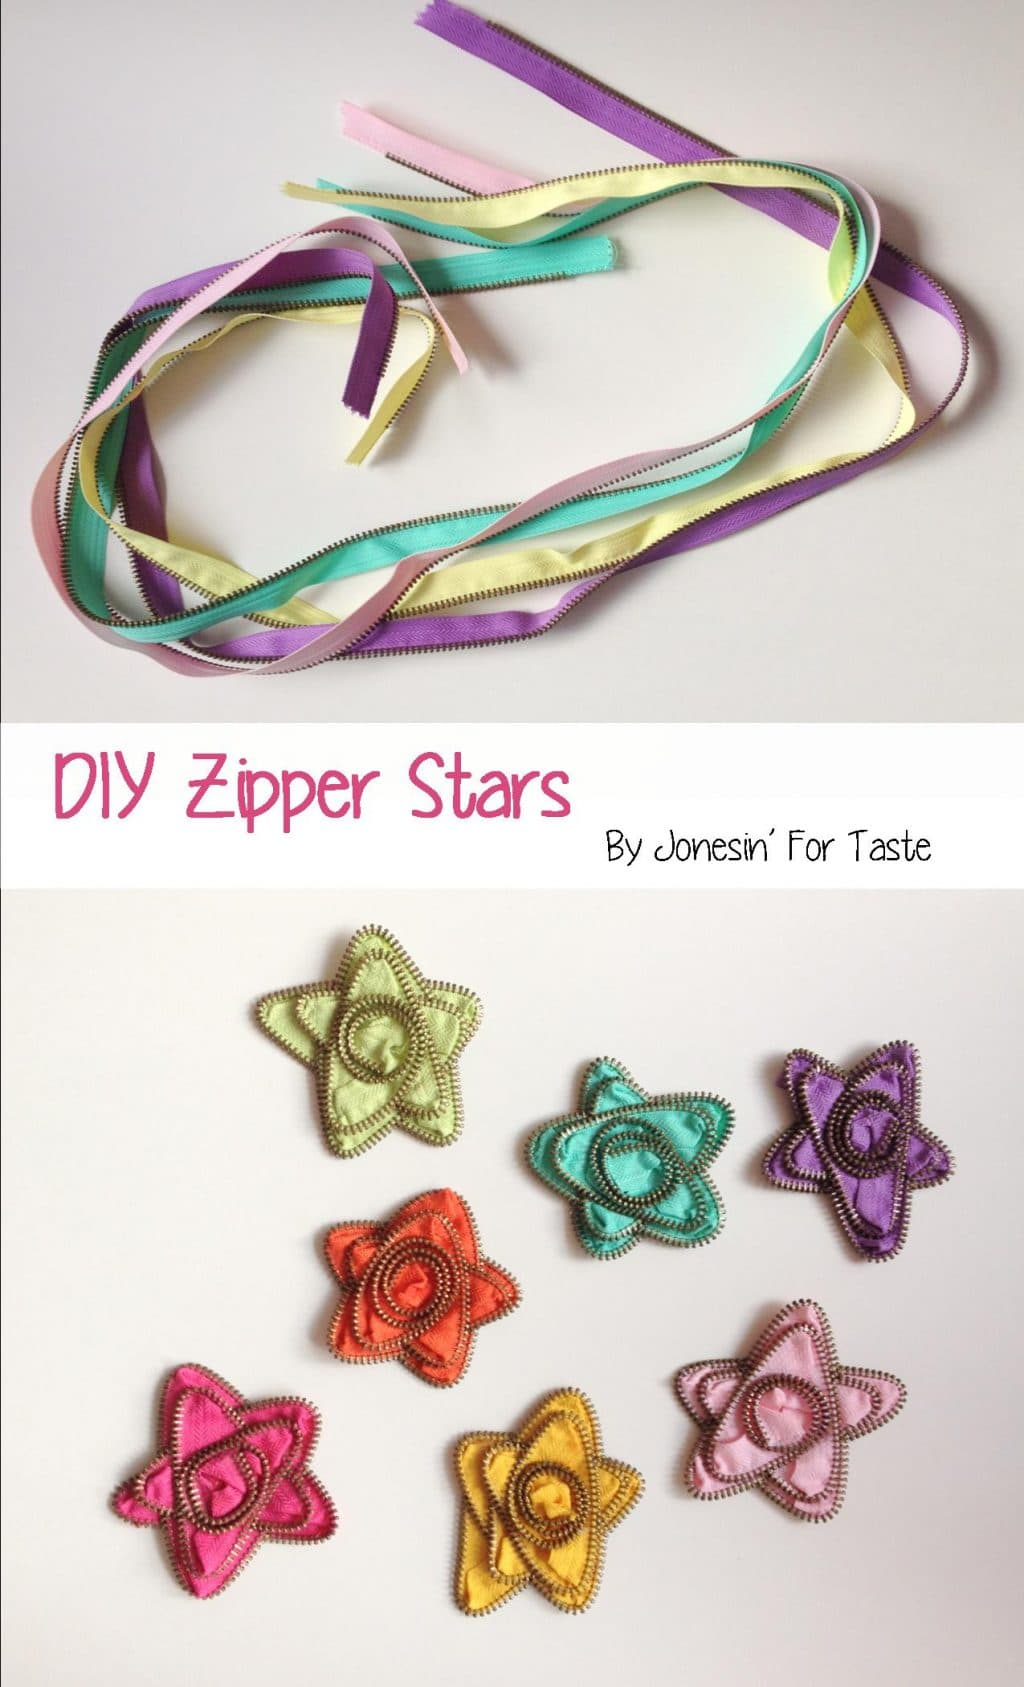 Zipper Stars